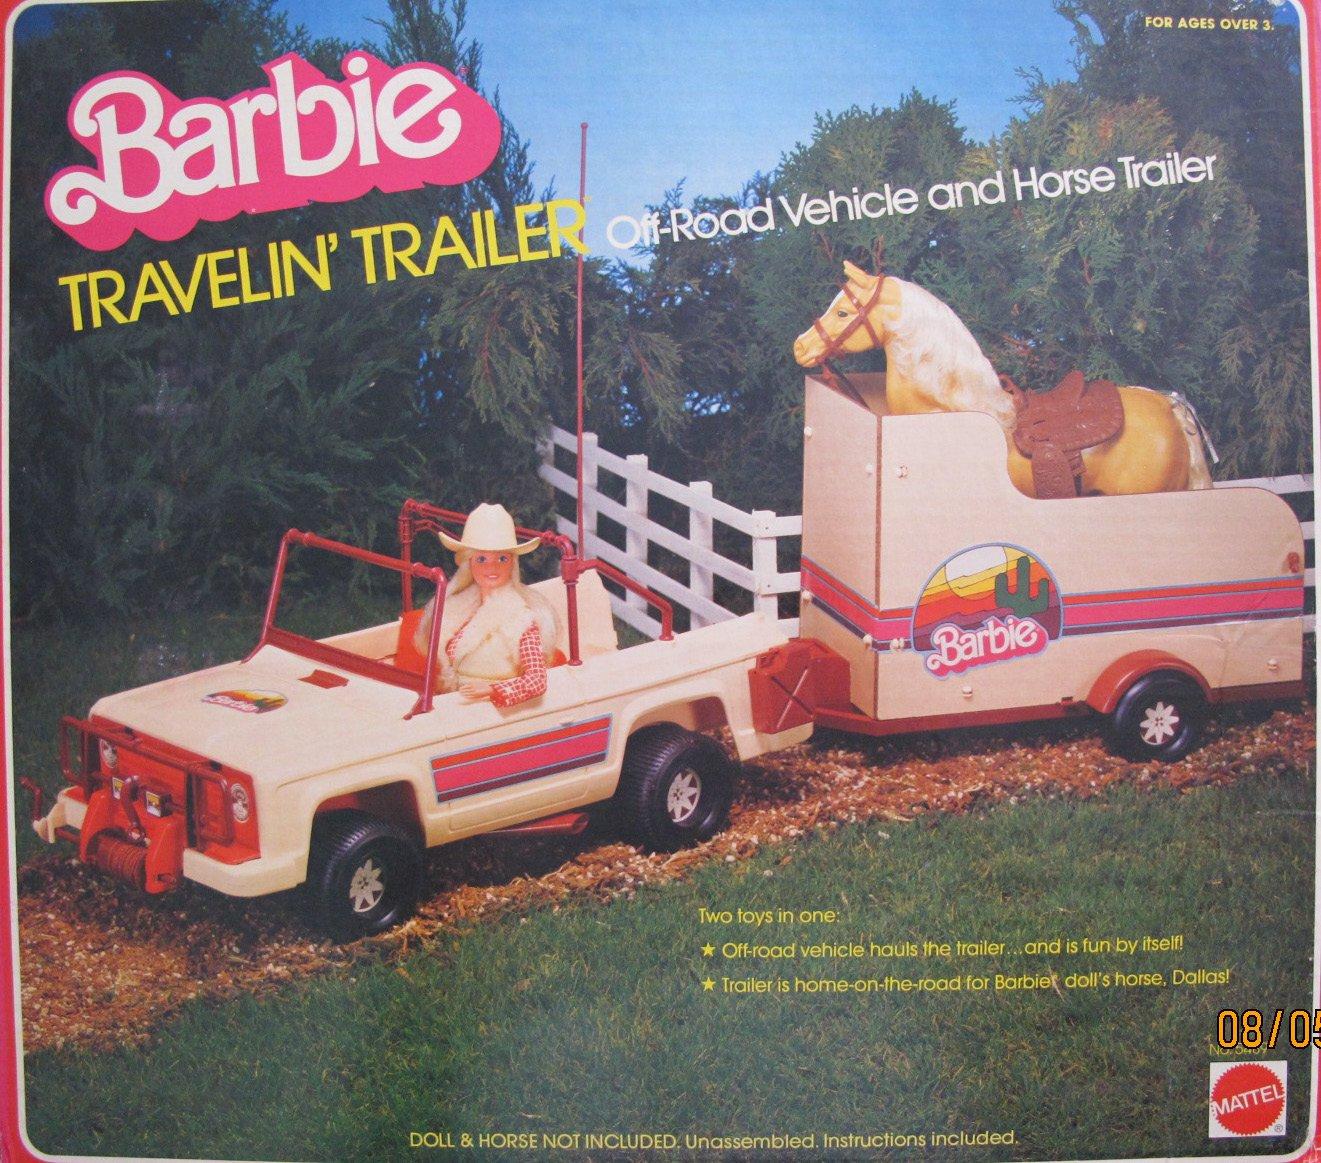 Amazon Barbie Travelin Trailer Off Road Vehicle Horse